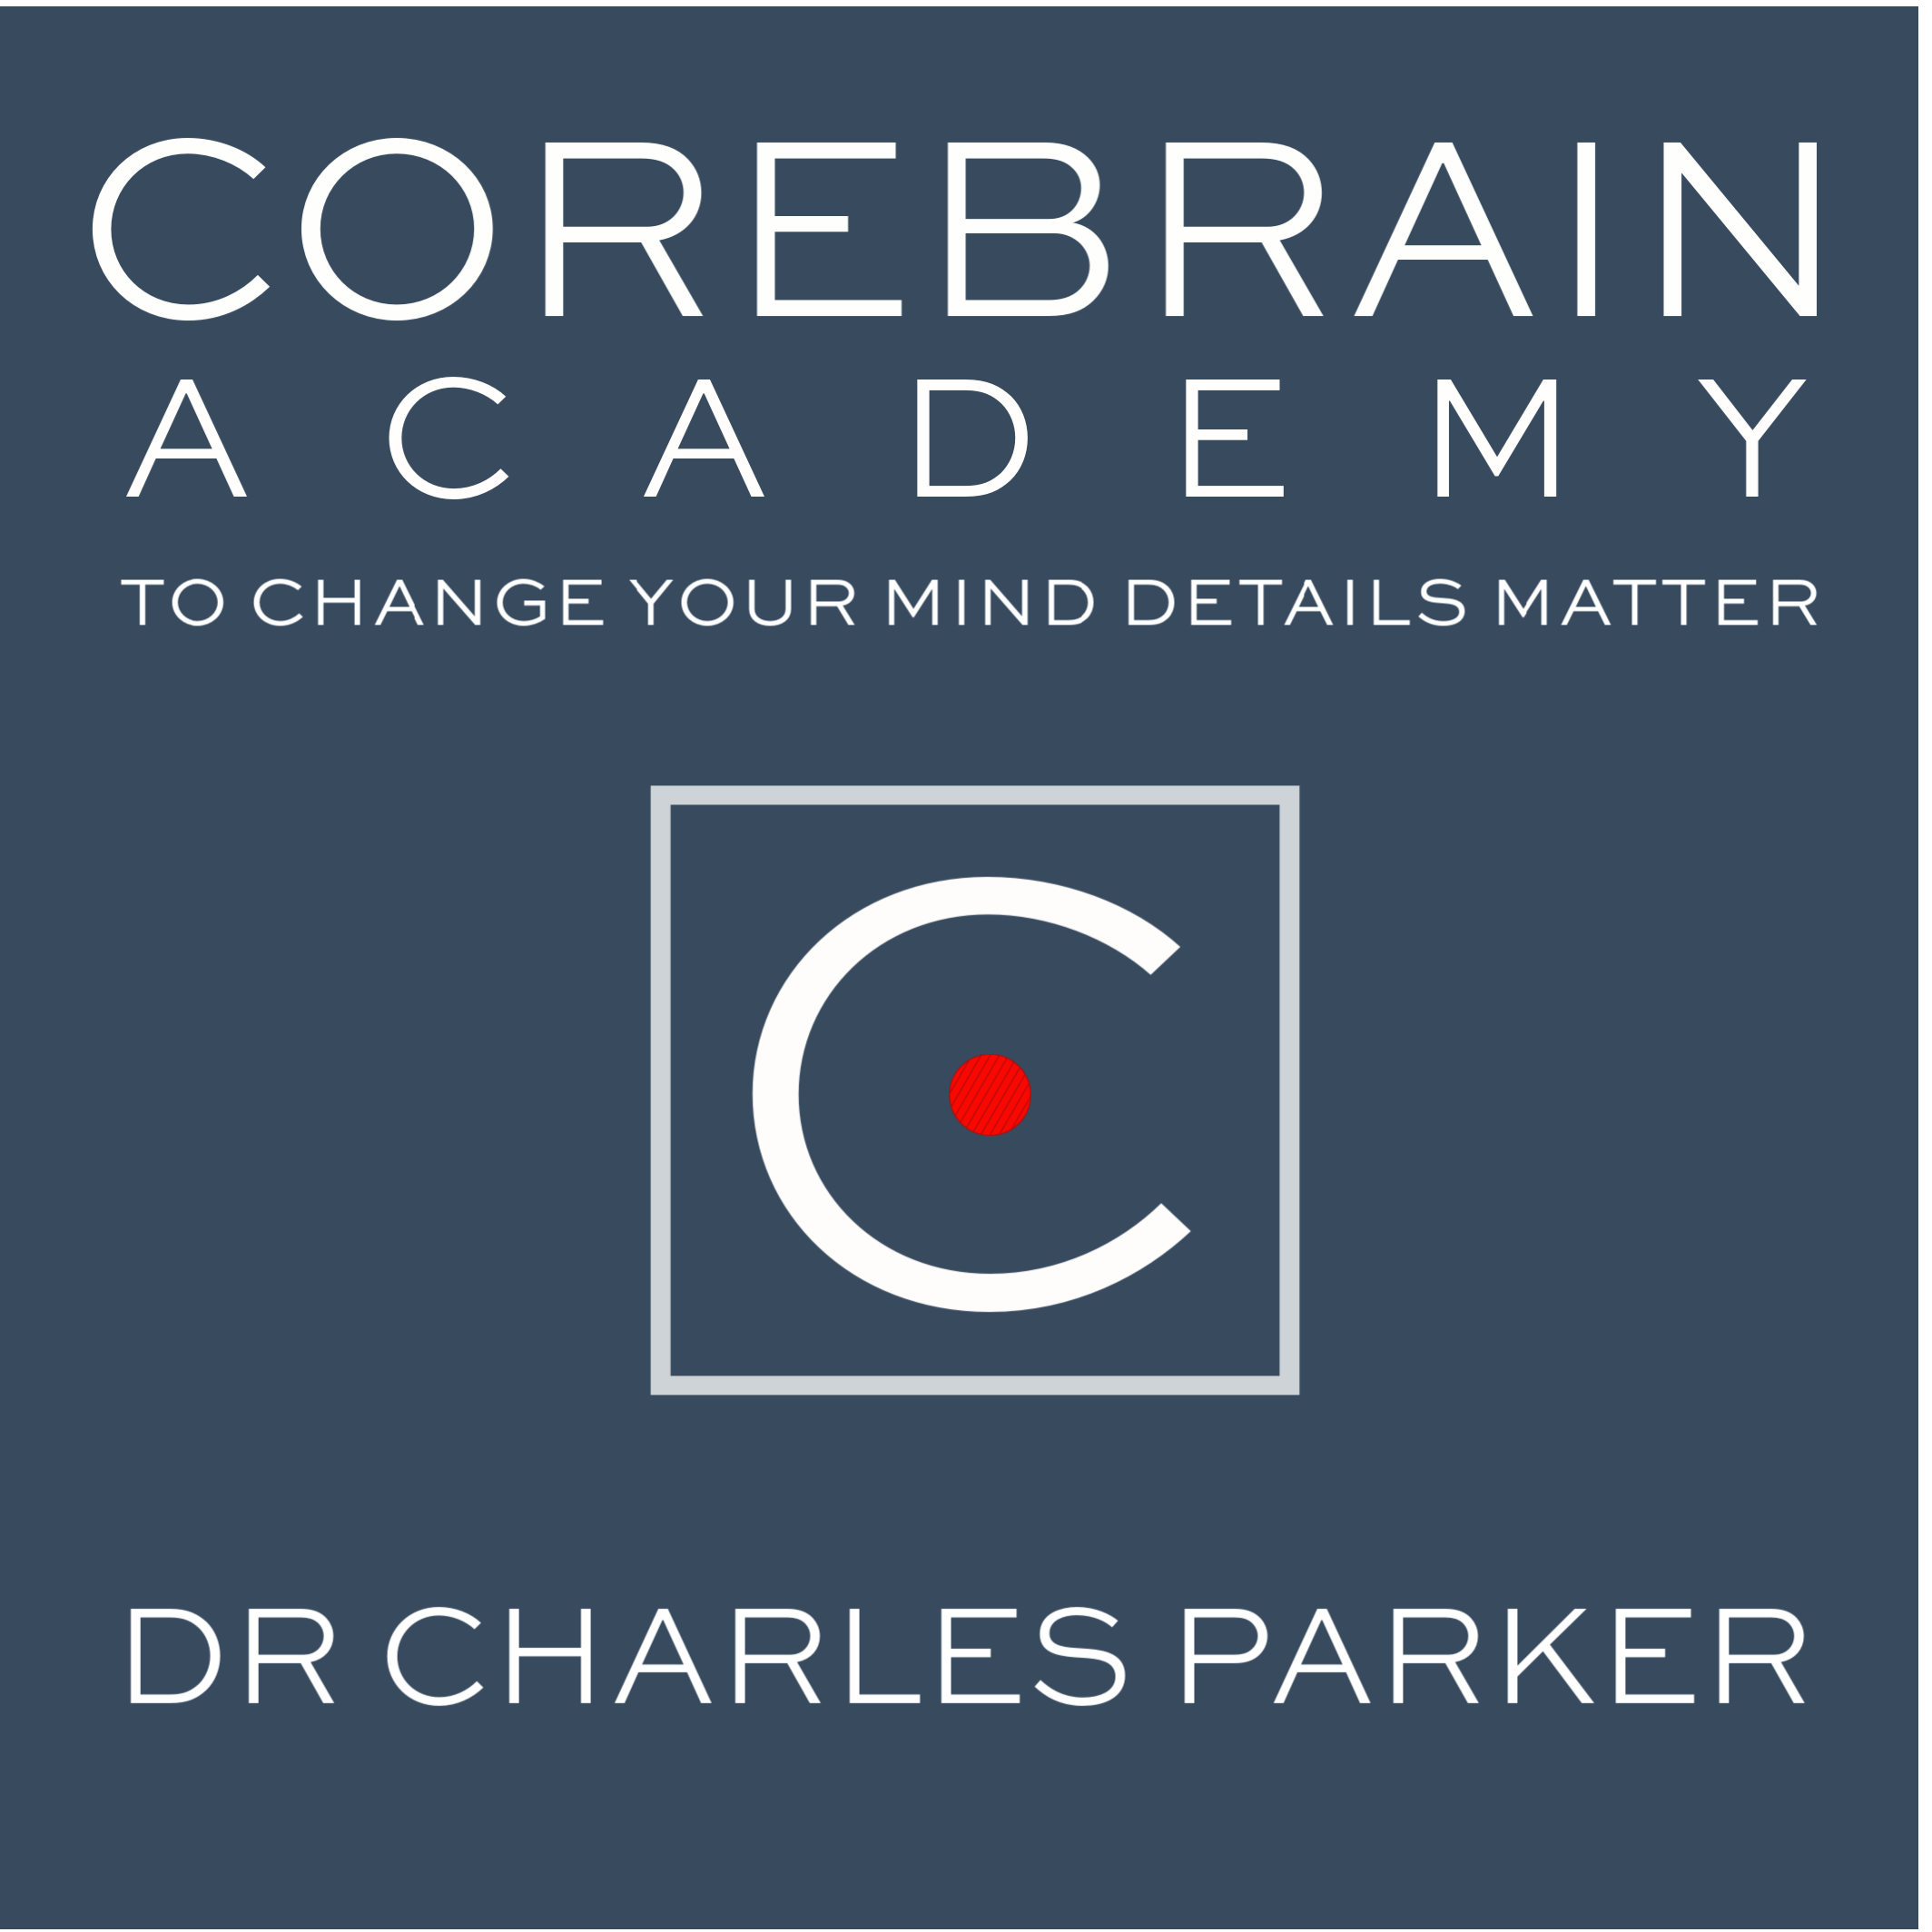 CoreBrain Academy